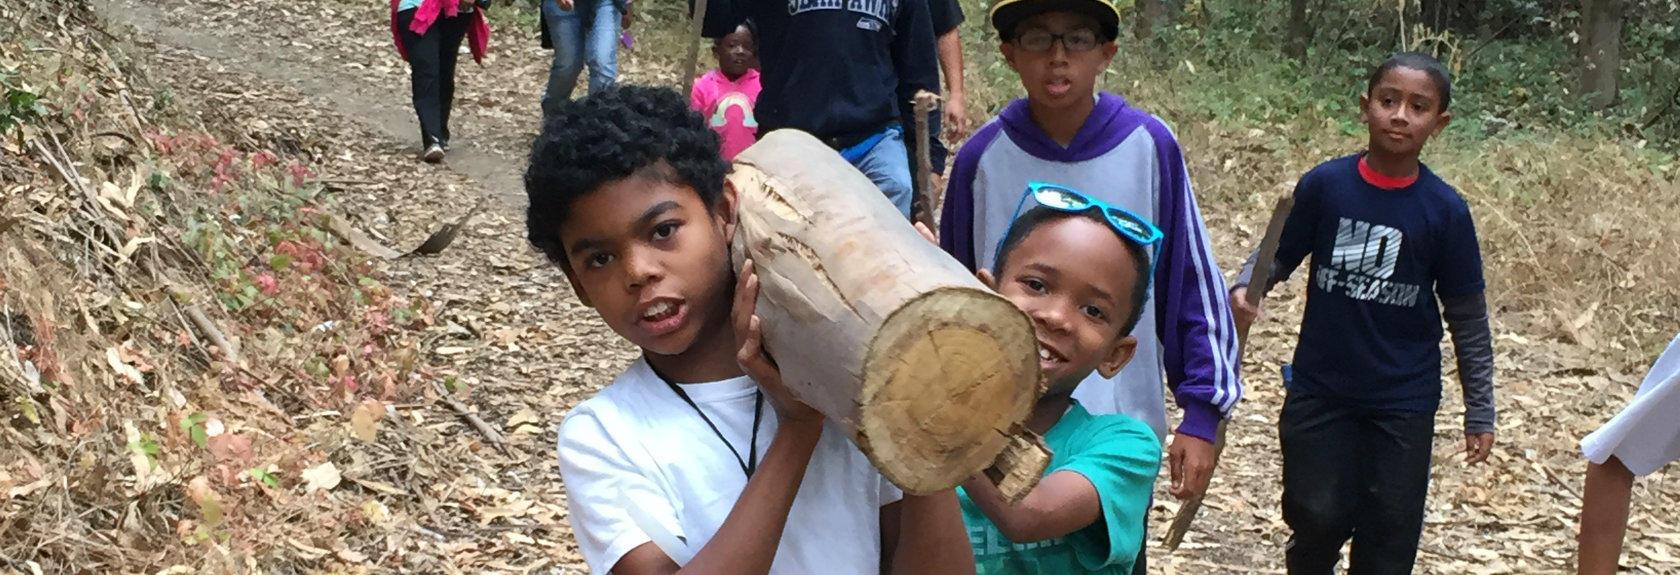 kids carring firewood, the village method